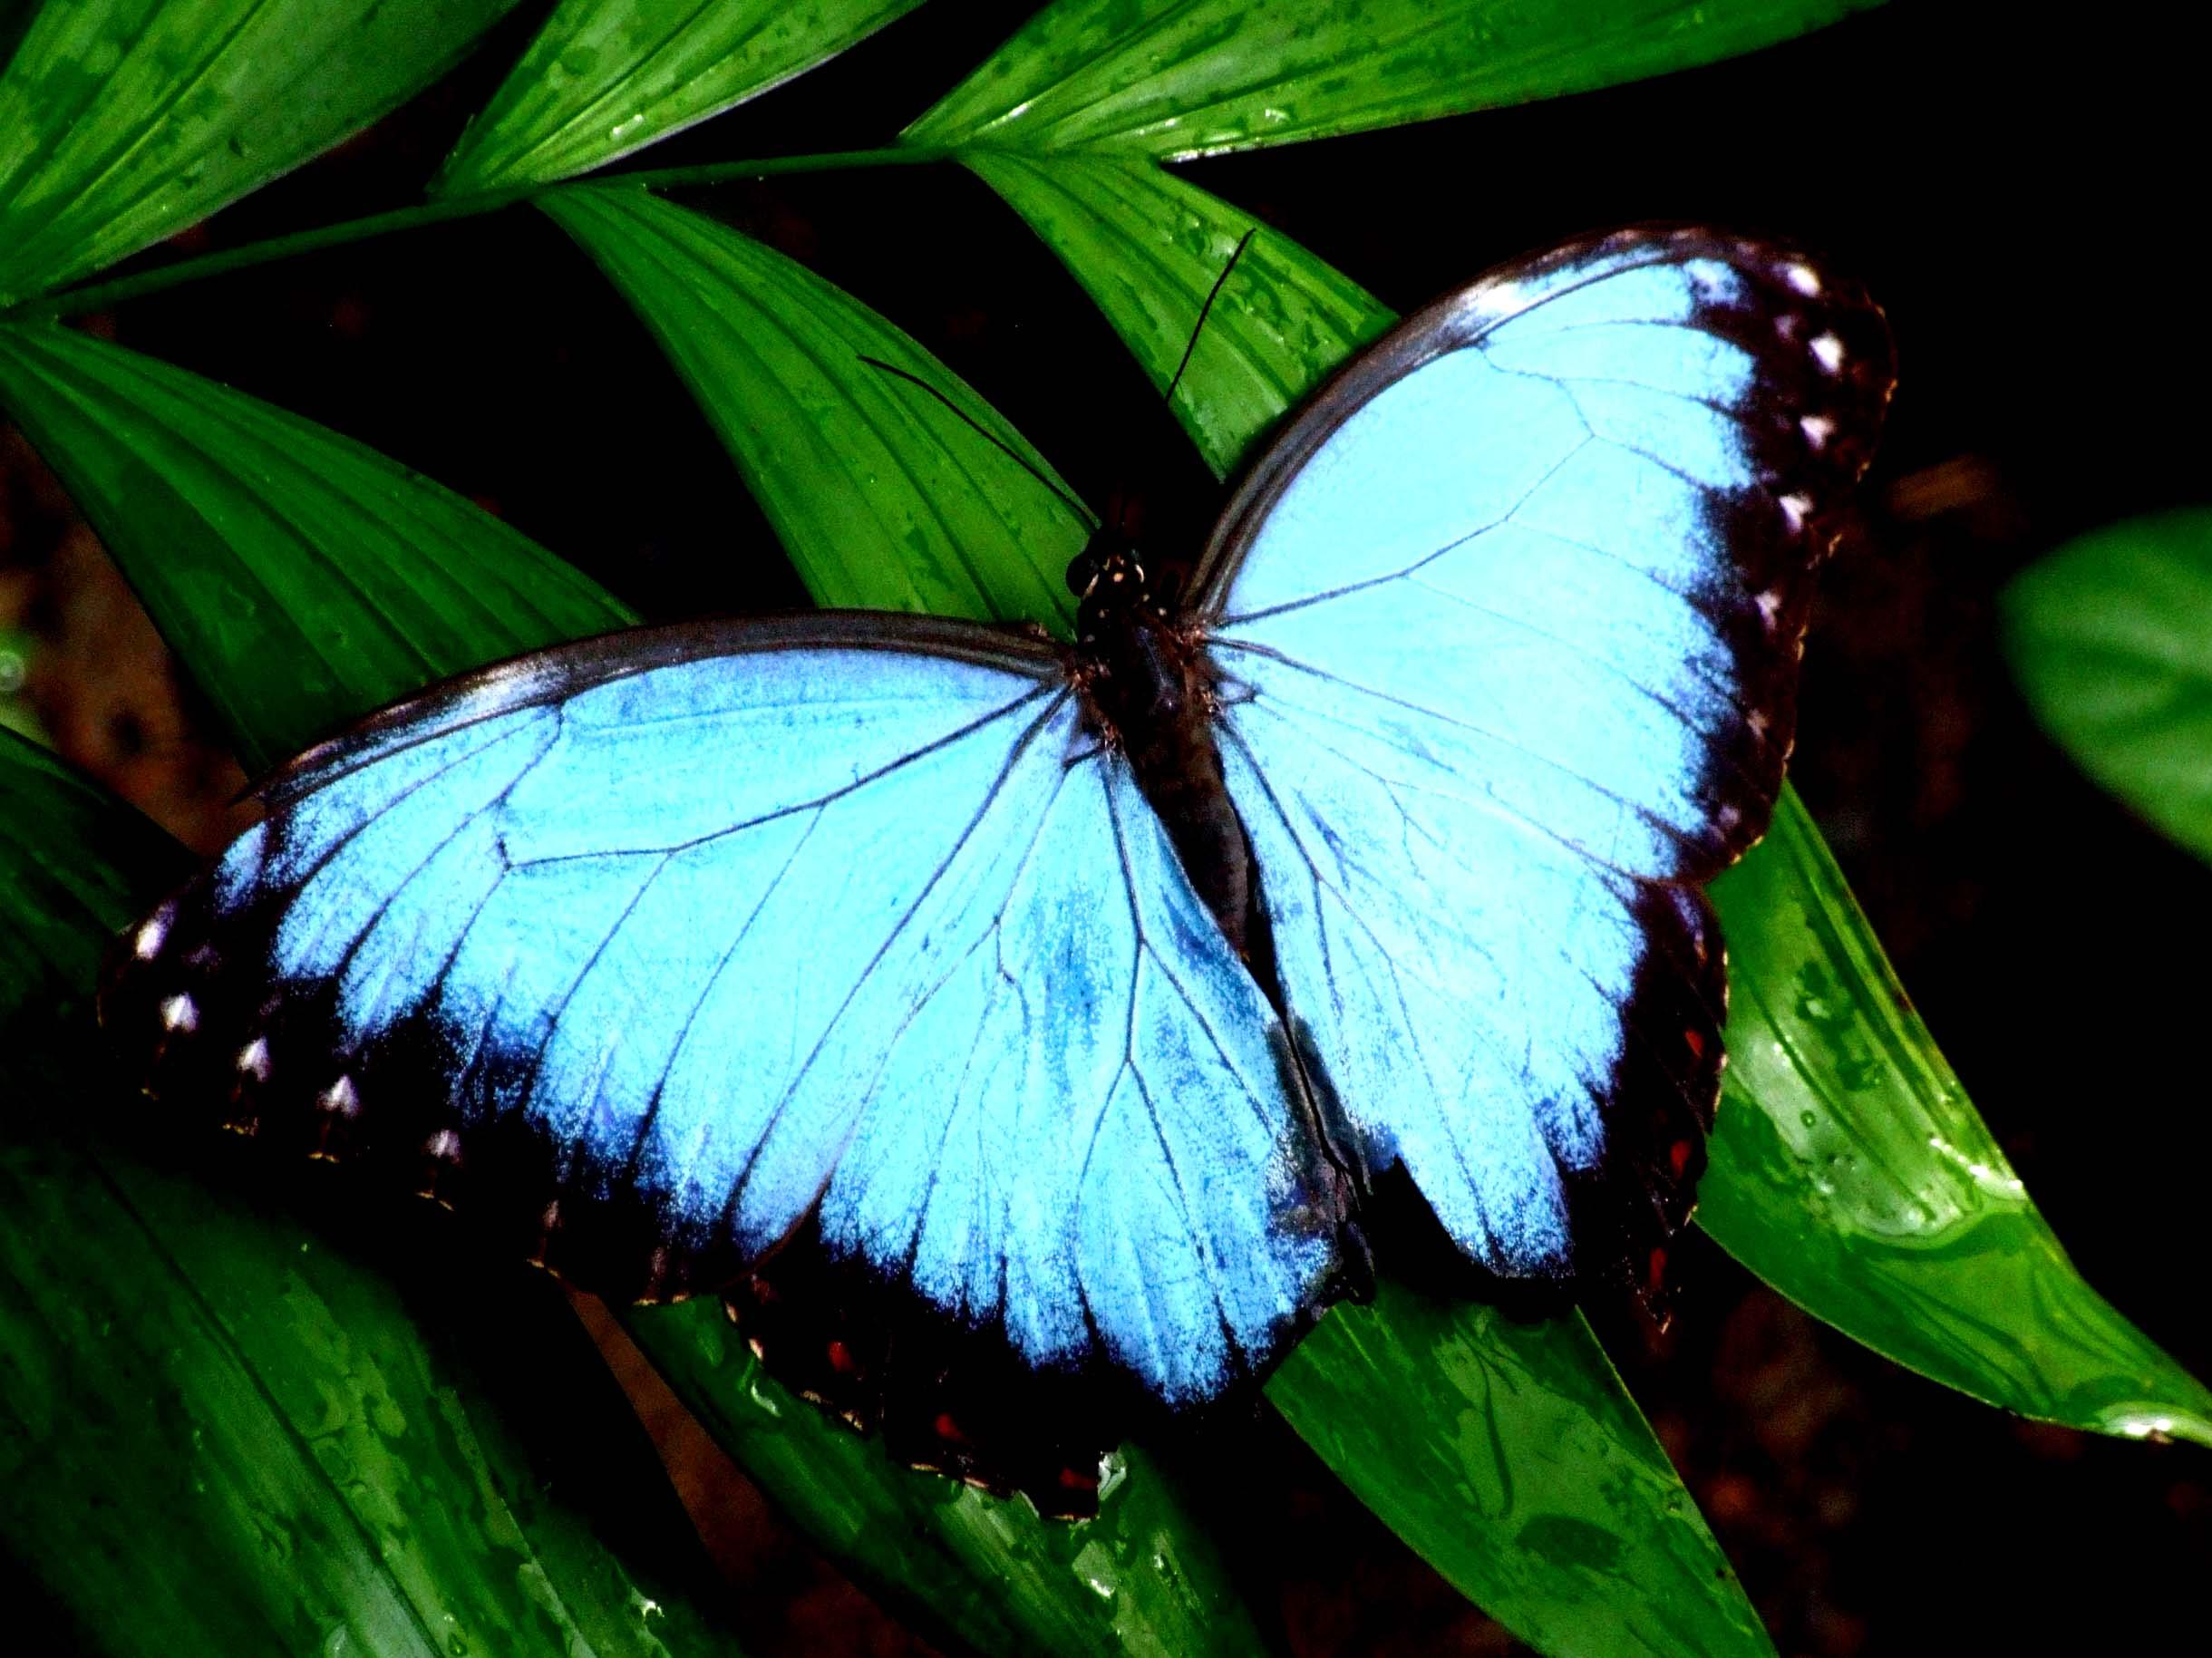 Vivid blue butterfly